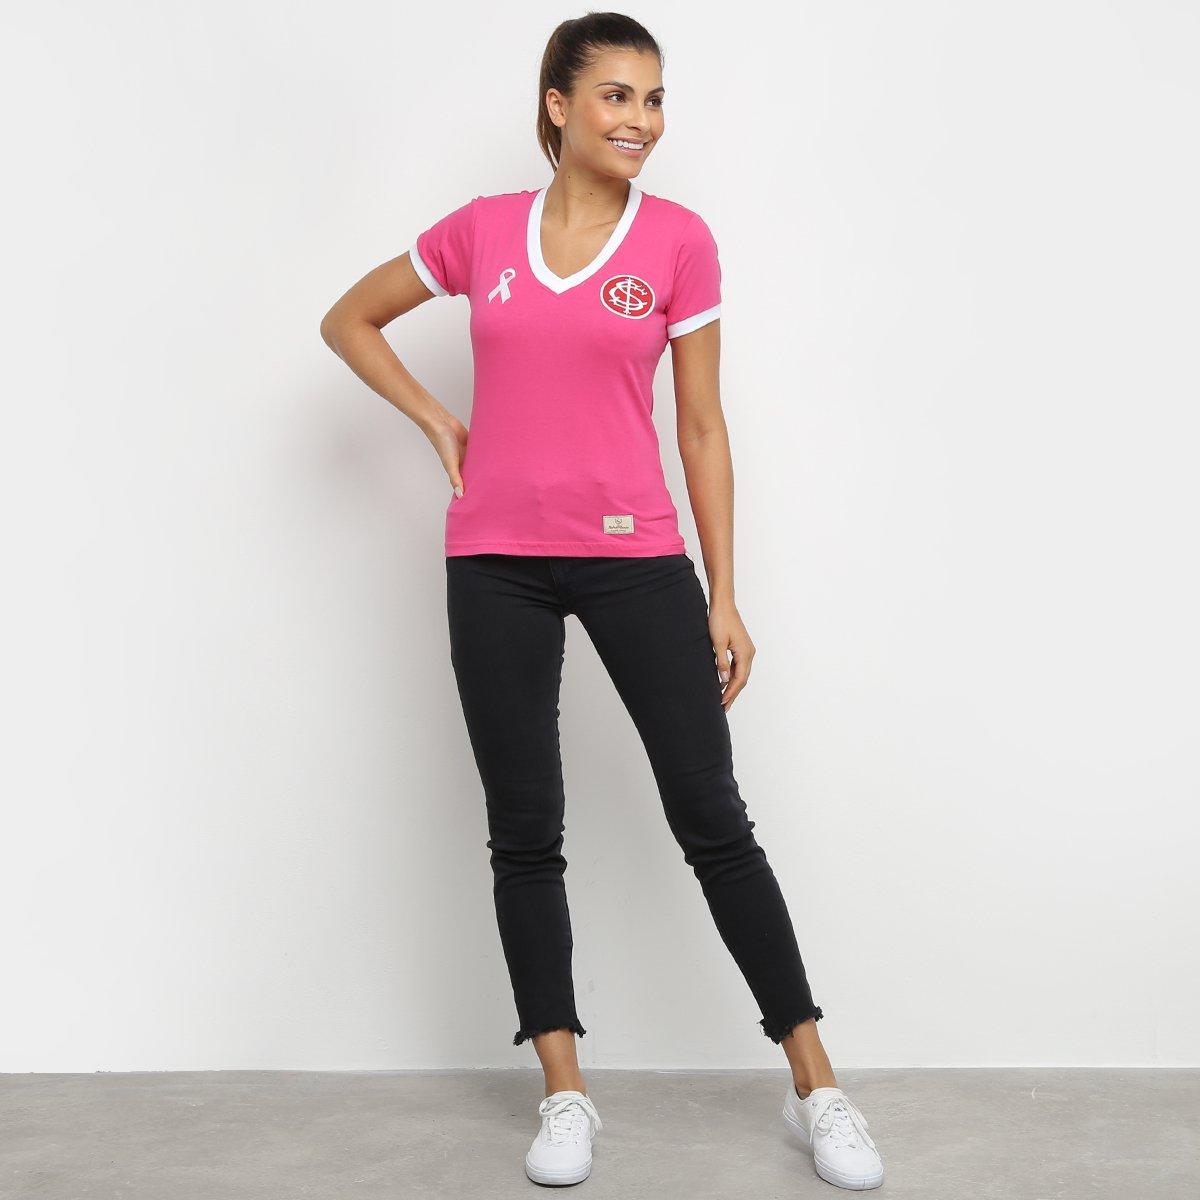 Camisa Internacional Outubro Rosa Retro Mania Feminina